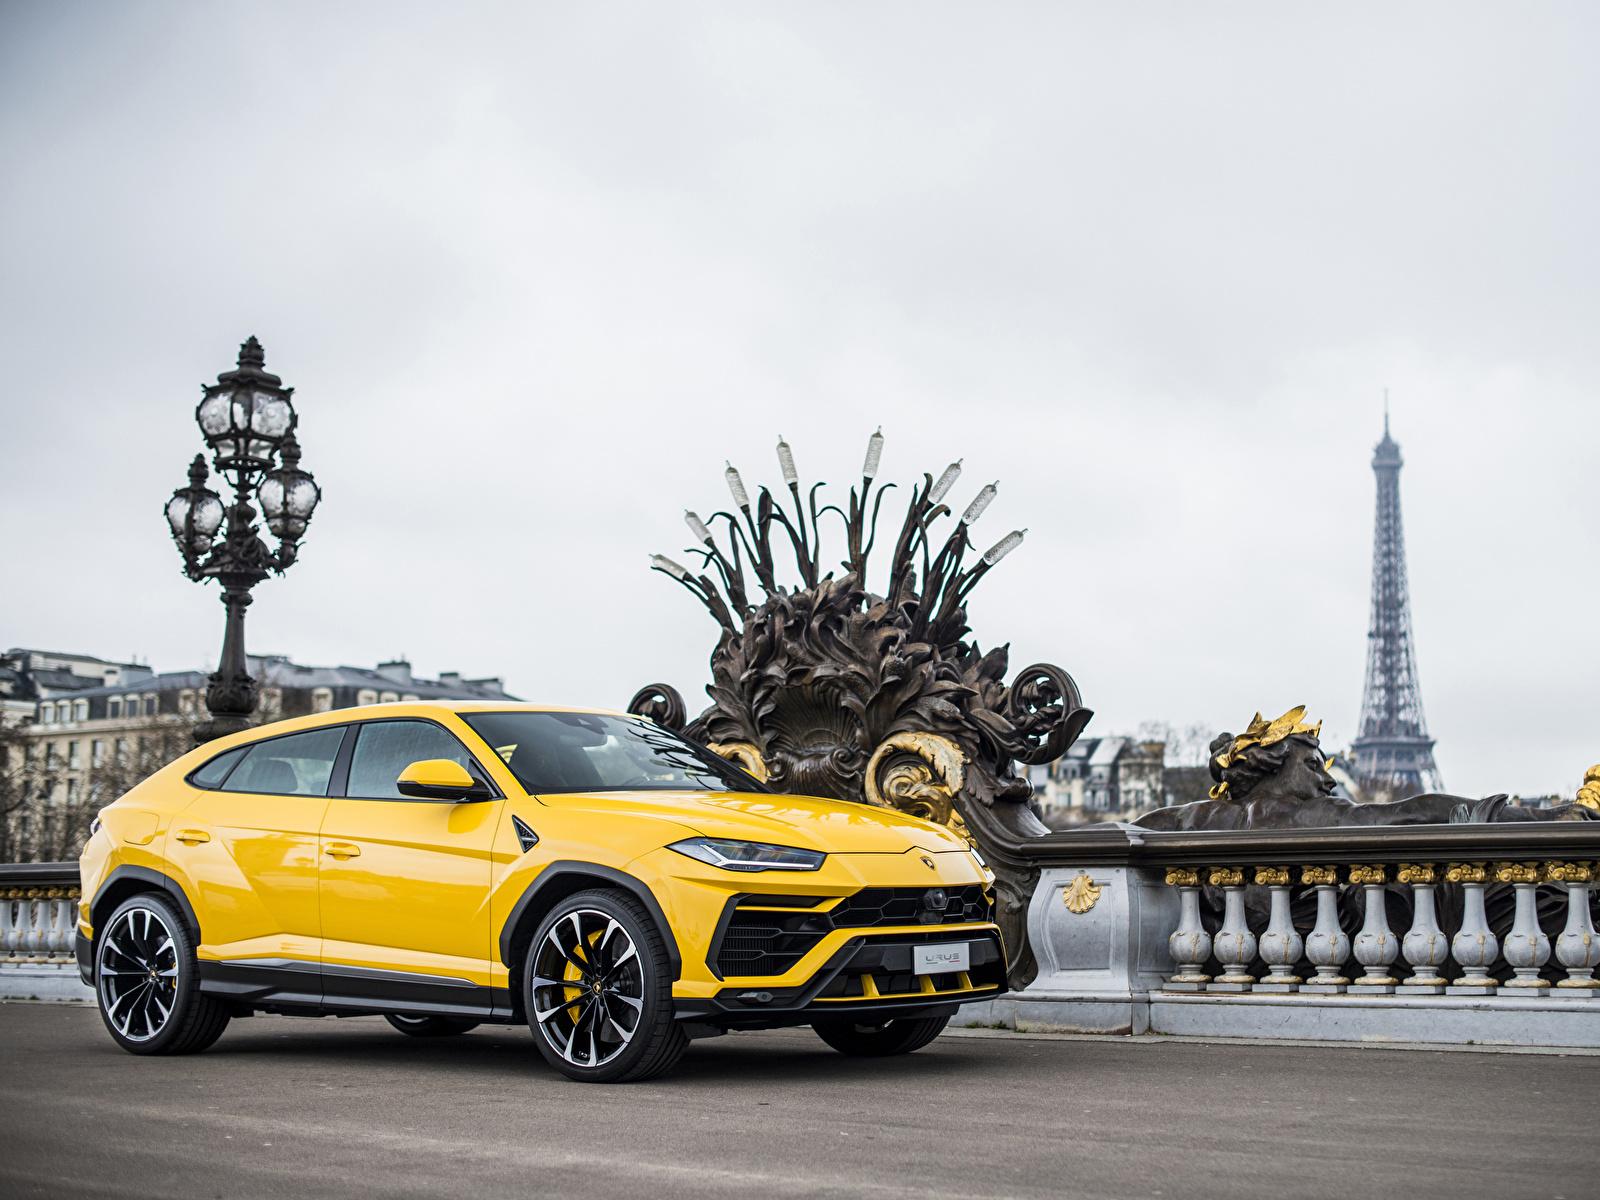 Hintergrundbilder Lamborghini 2018 Urus Gelb Autos Metallisch 1600x1200